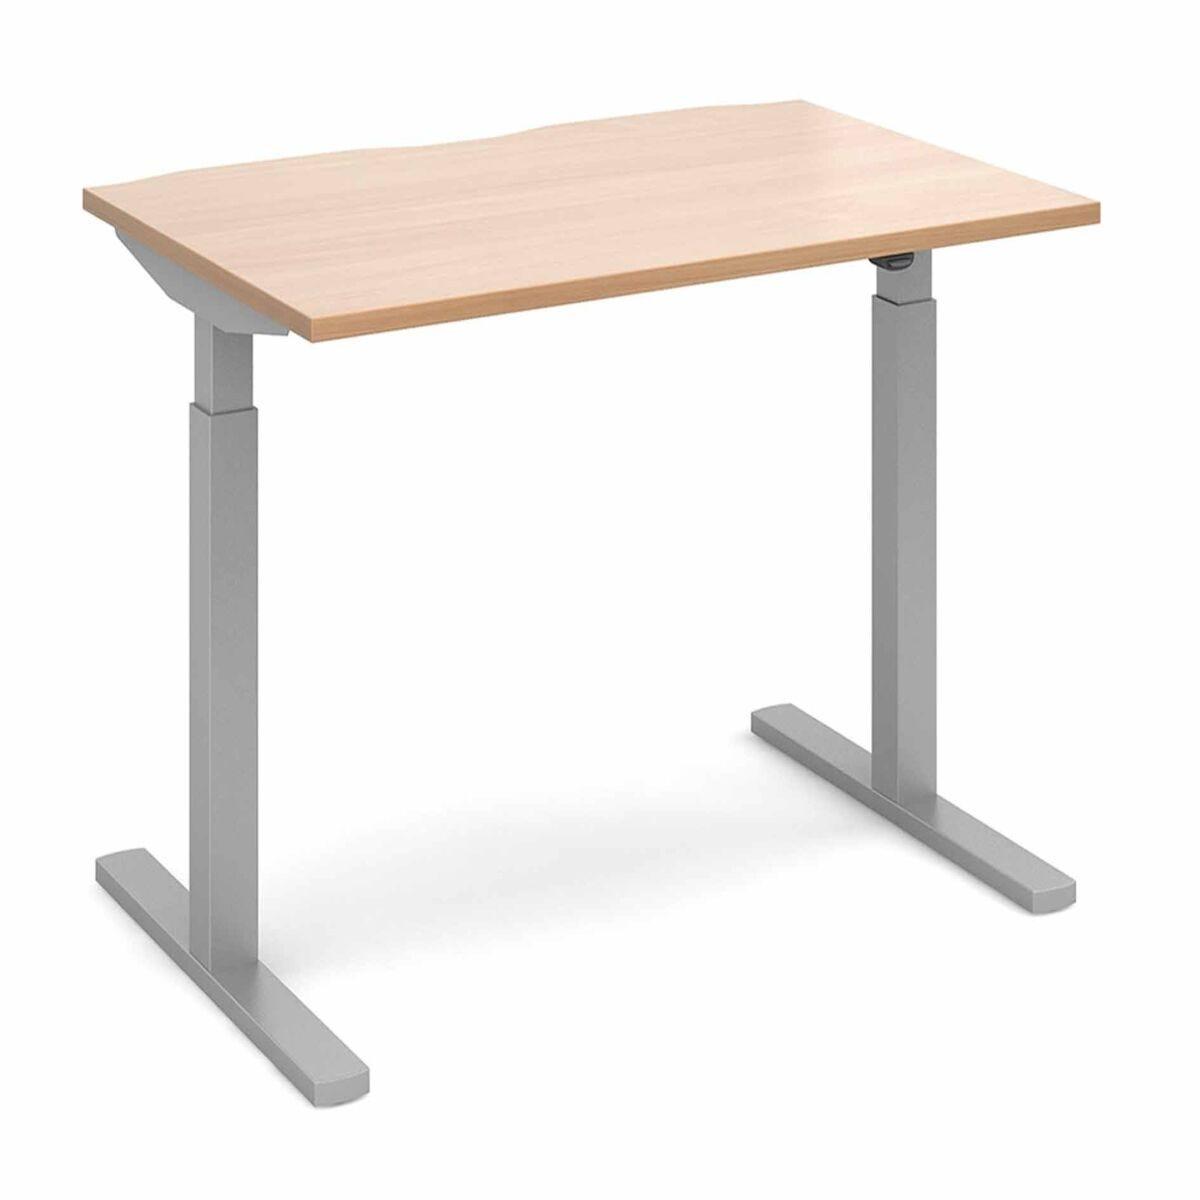 Elev8 Mono Straight Sit Stand Desk 1200mm x 800mm